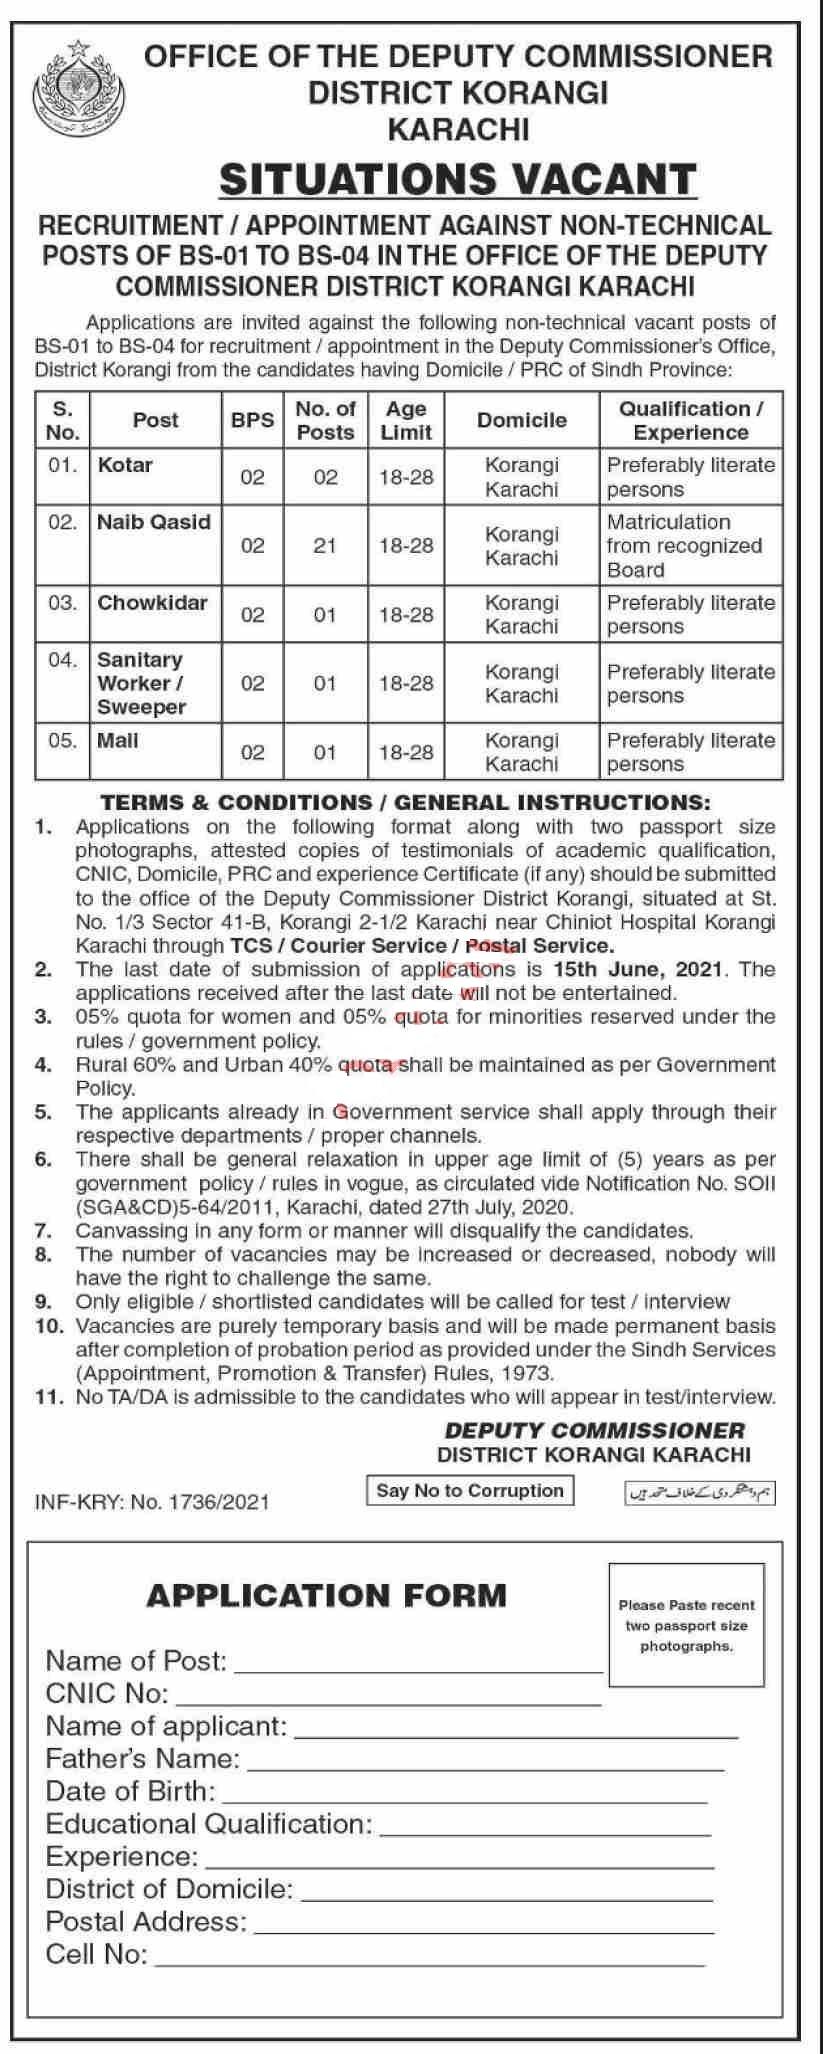 Deputy Commissioner DC District Korangi Karachi Jobs 2021